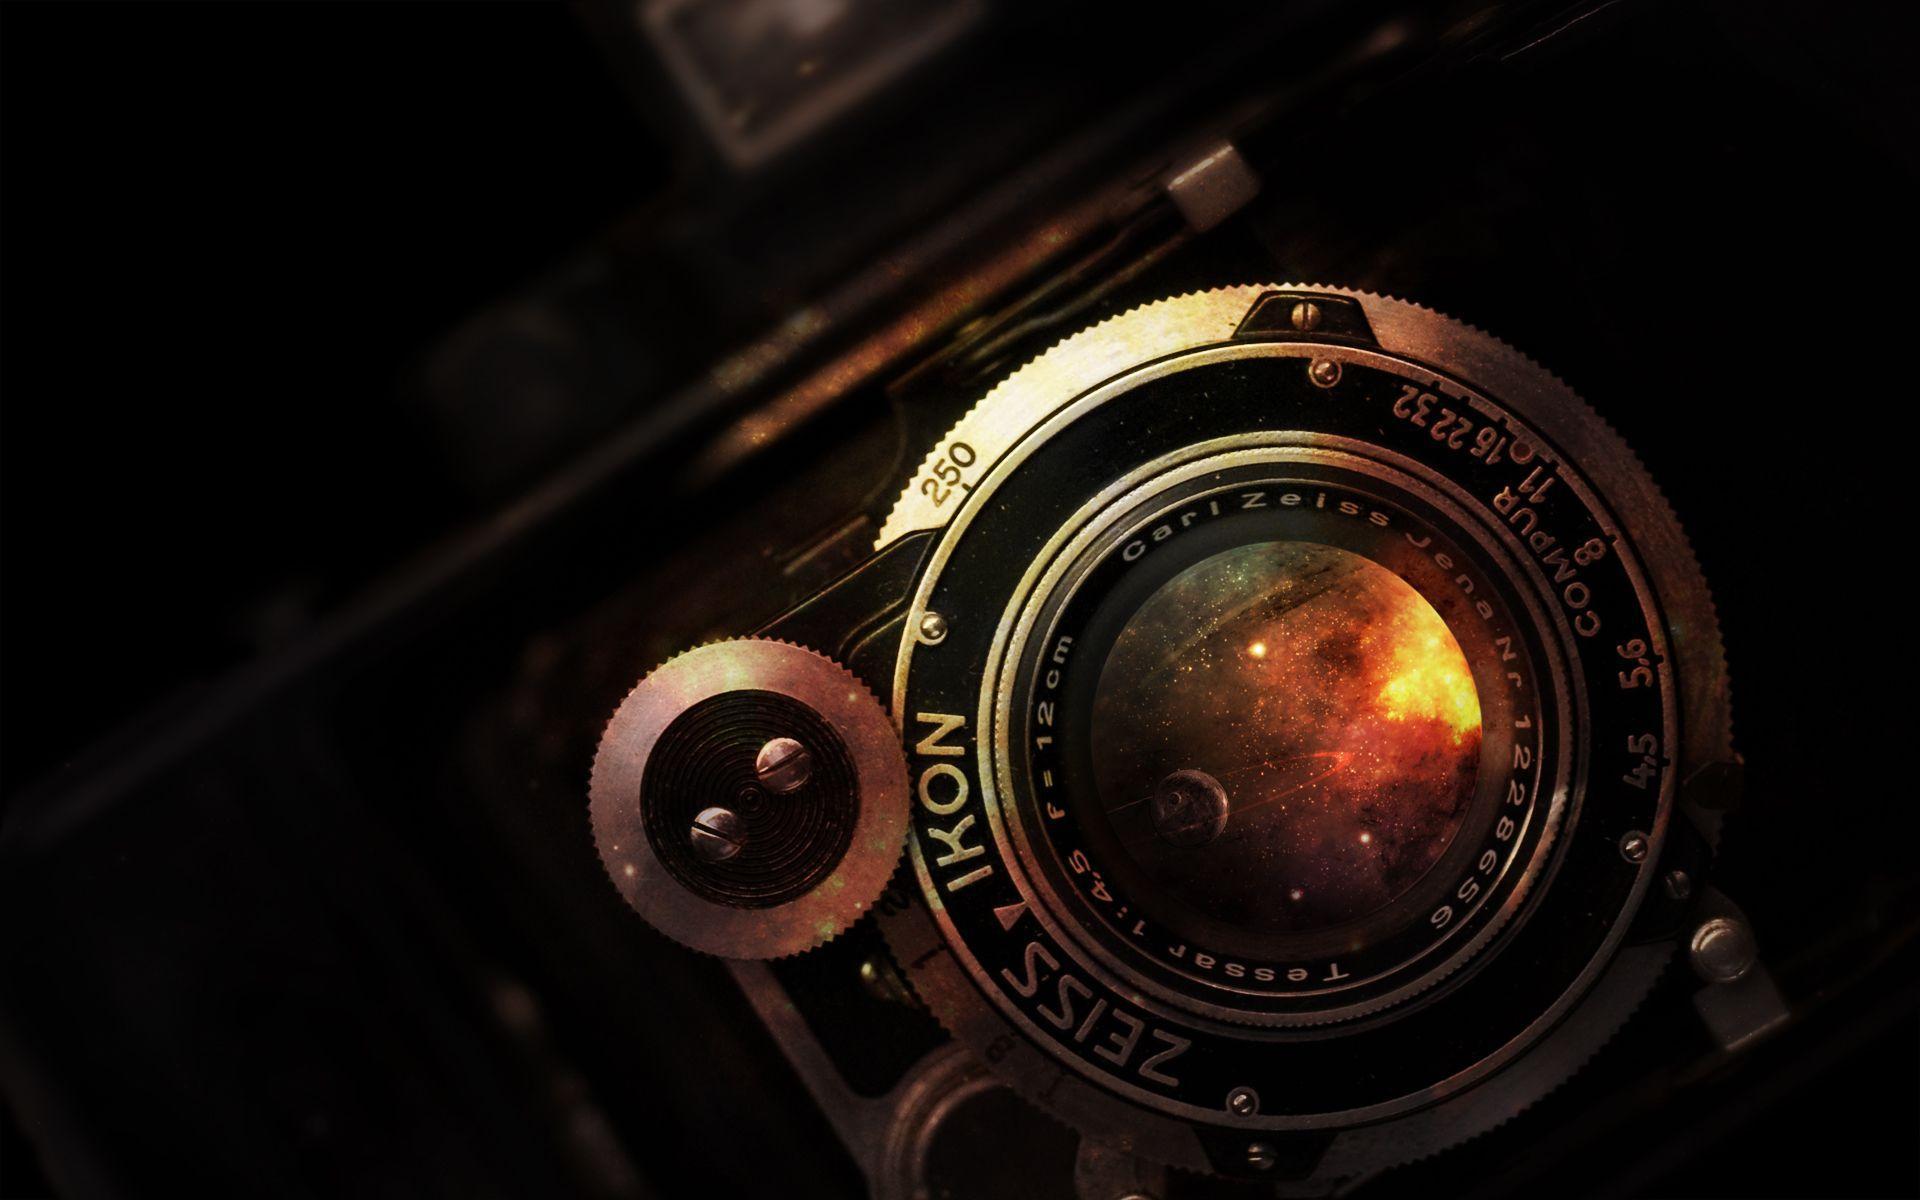 Lens wallpaper | 1920x1200 | #71750